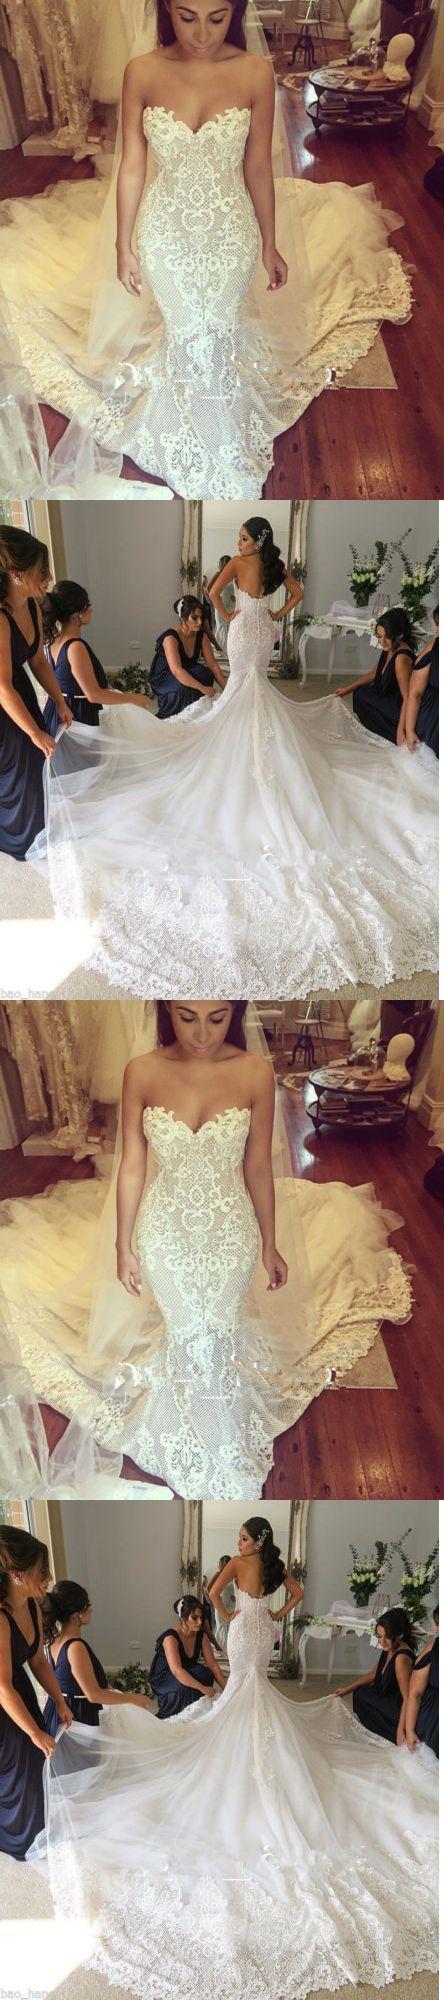 Wedding Dresses: New Mermaid Lace Wedding Dress Long Bridal Gown Custom 4 6 8 10 12 14 16 18+++++ -> BUY IT NOW ONLY: $126.8 on eBay!